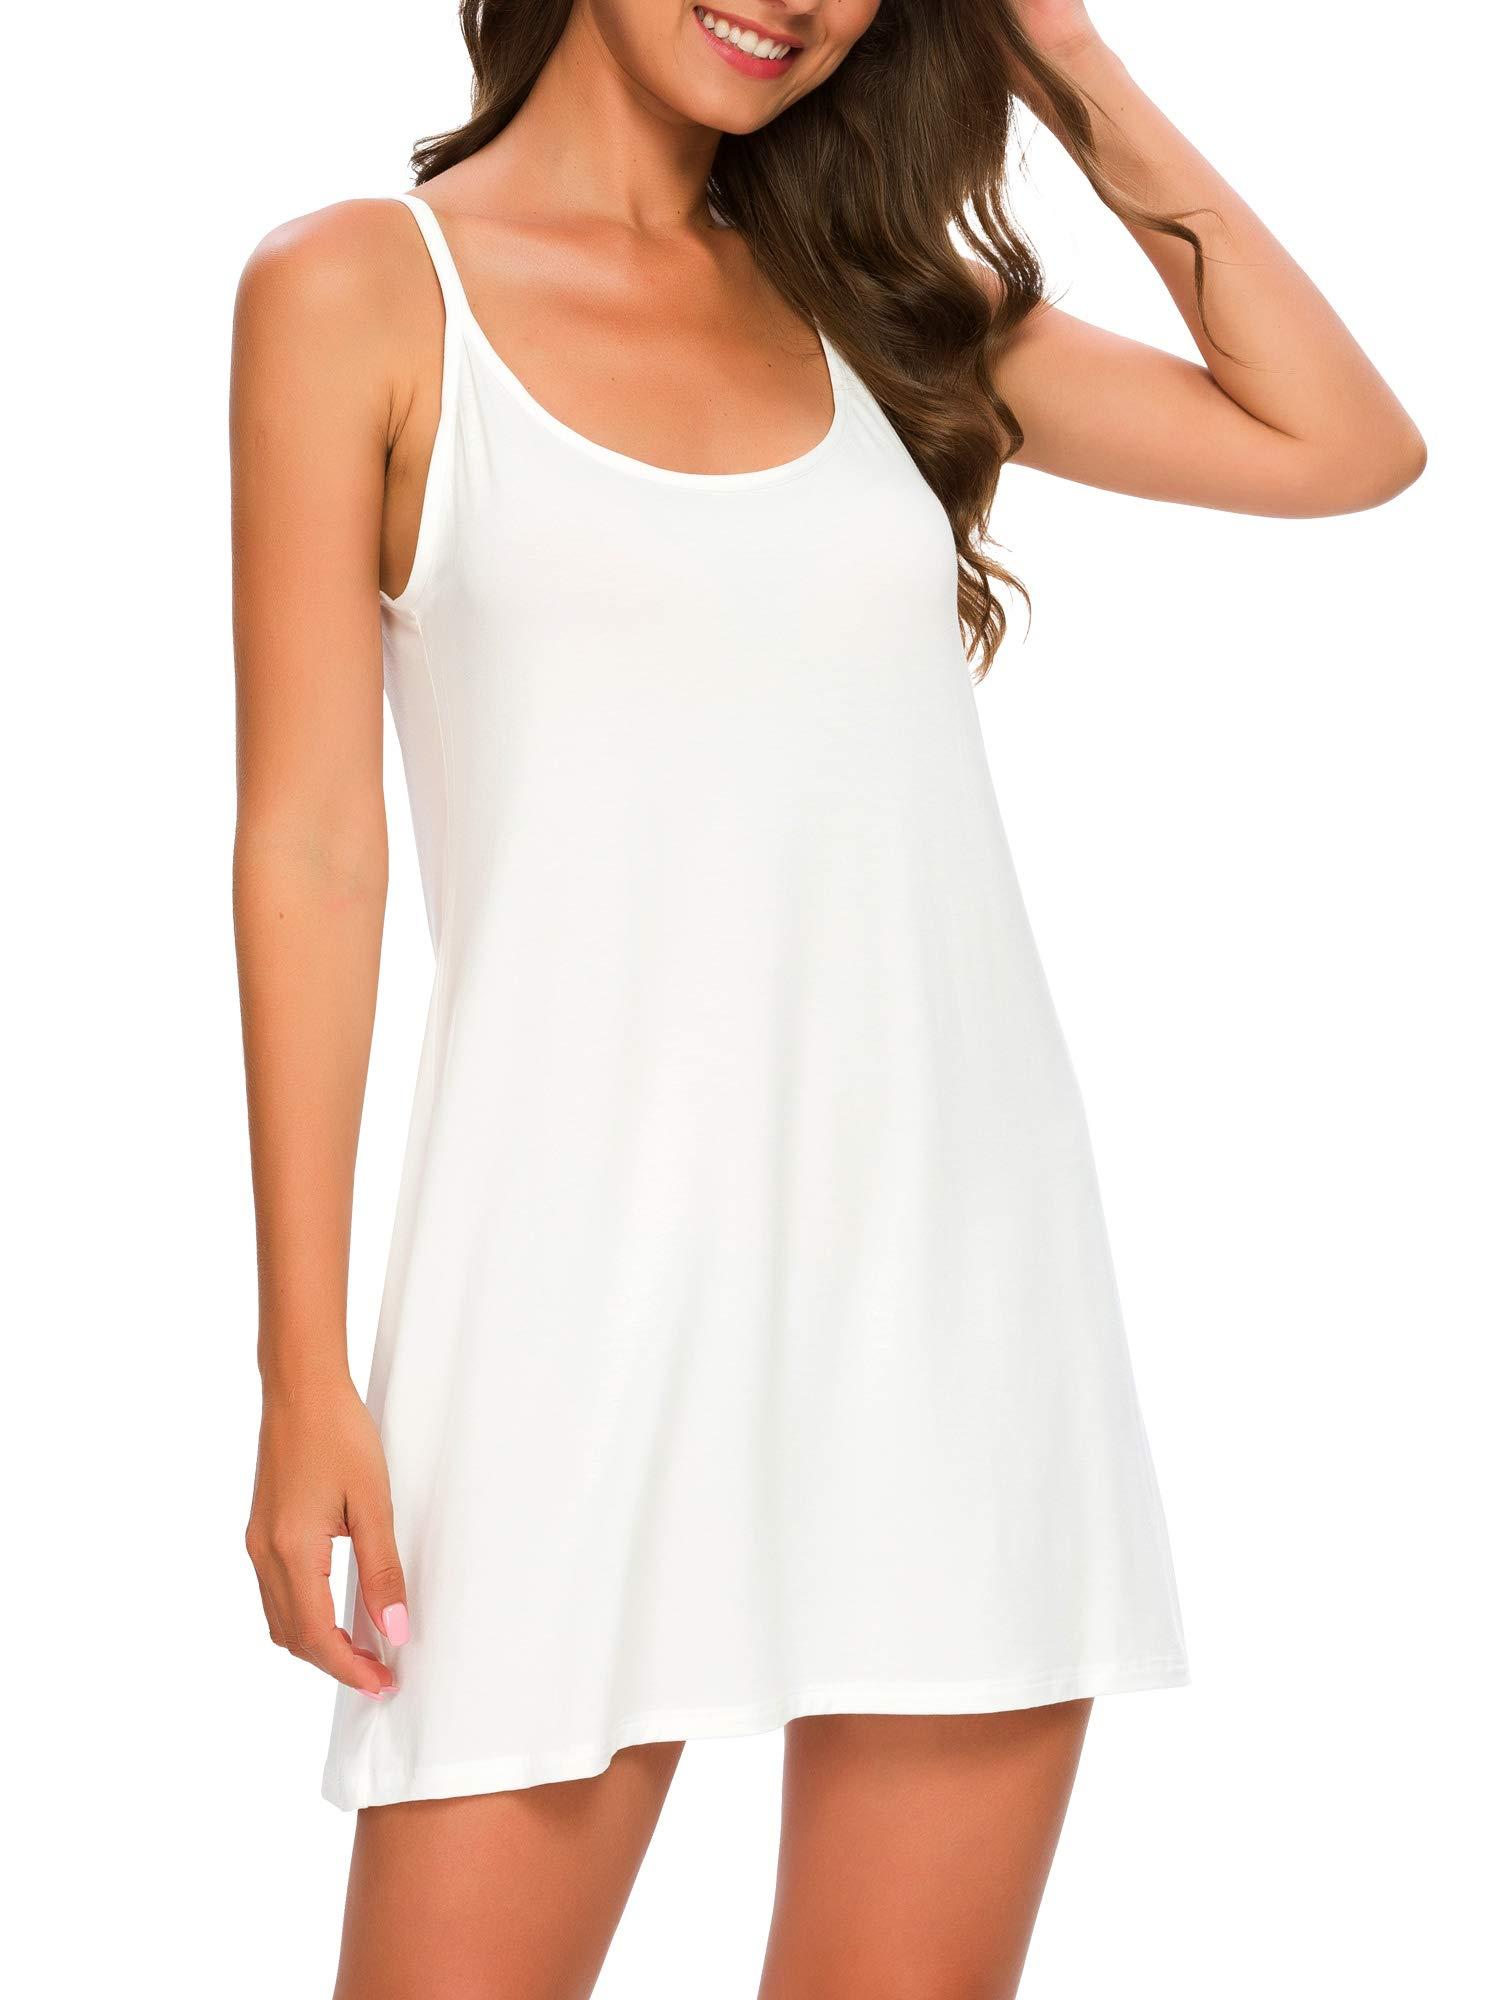 TIKTIK Womens Sexy Modal Comfy Nightgown Full Slip Chemise Sleep Shirt Plus Size S-4XL